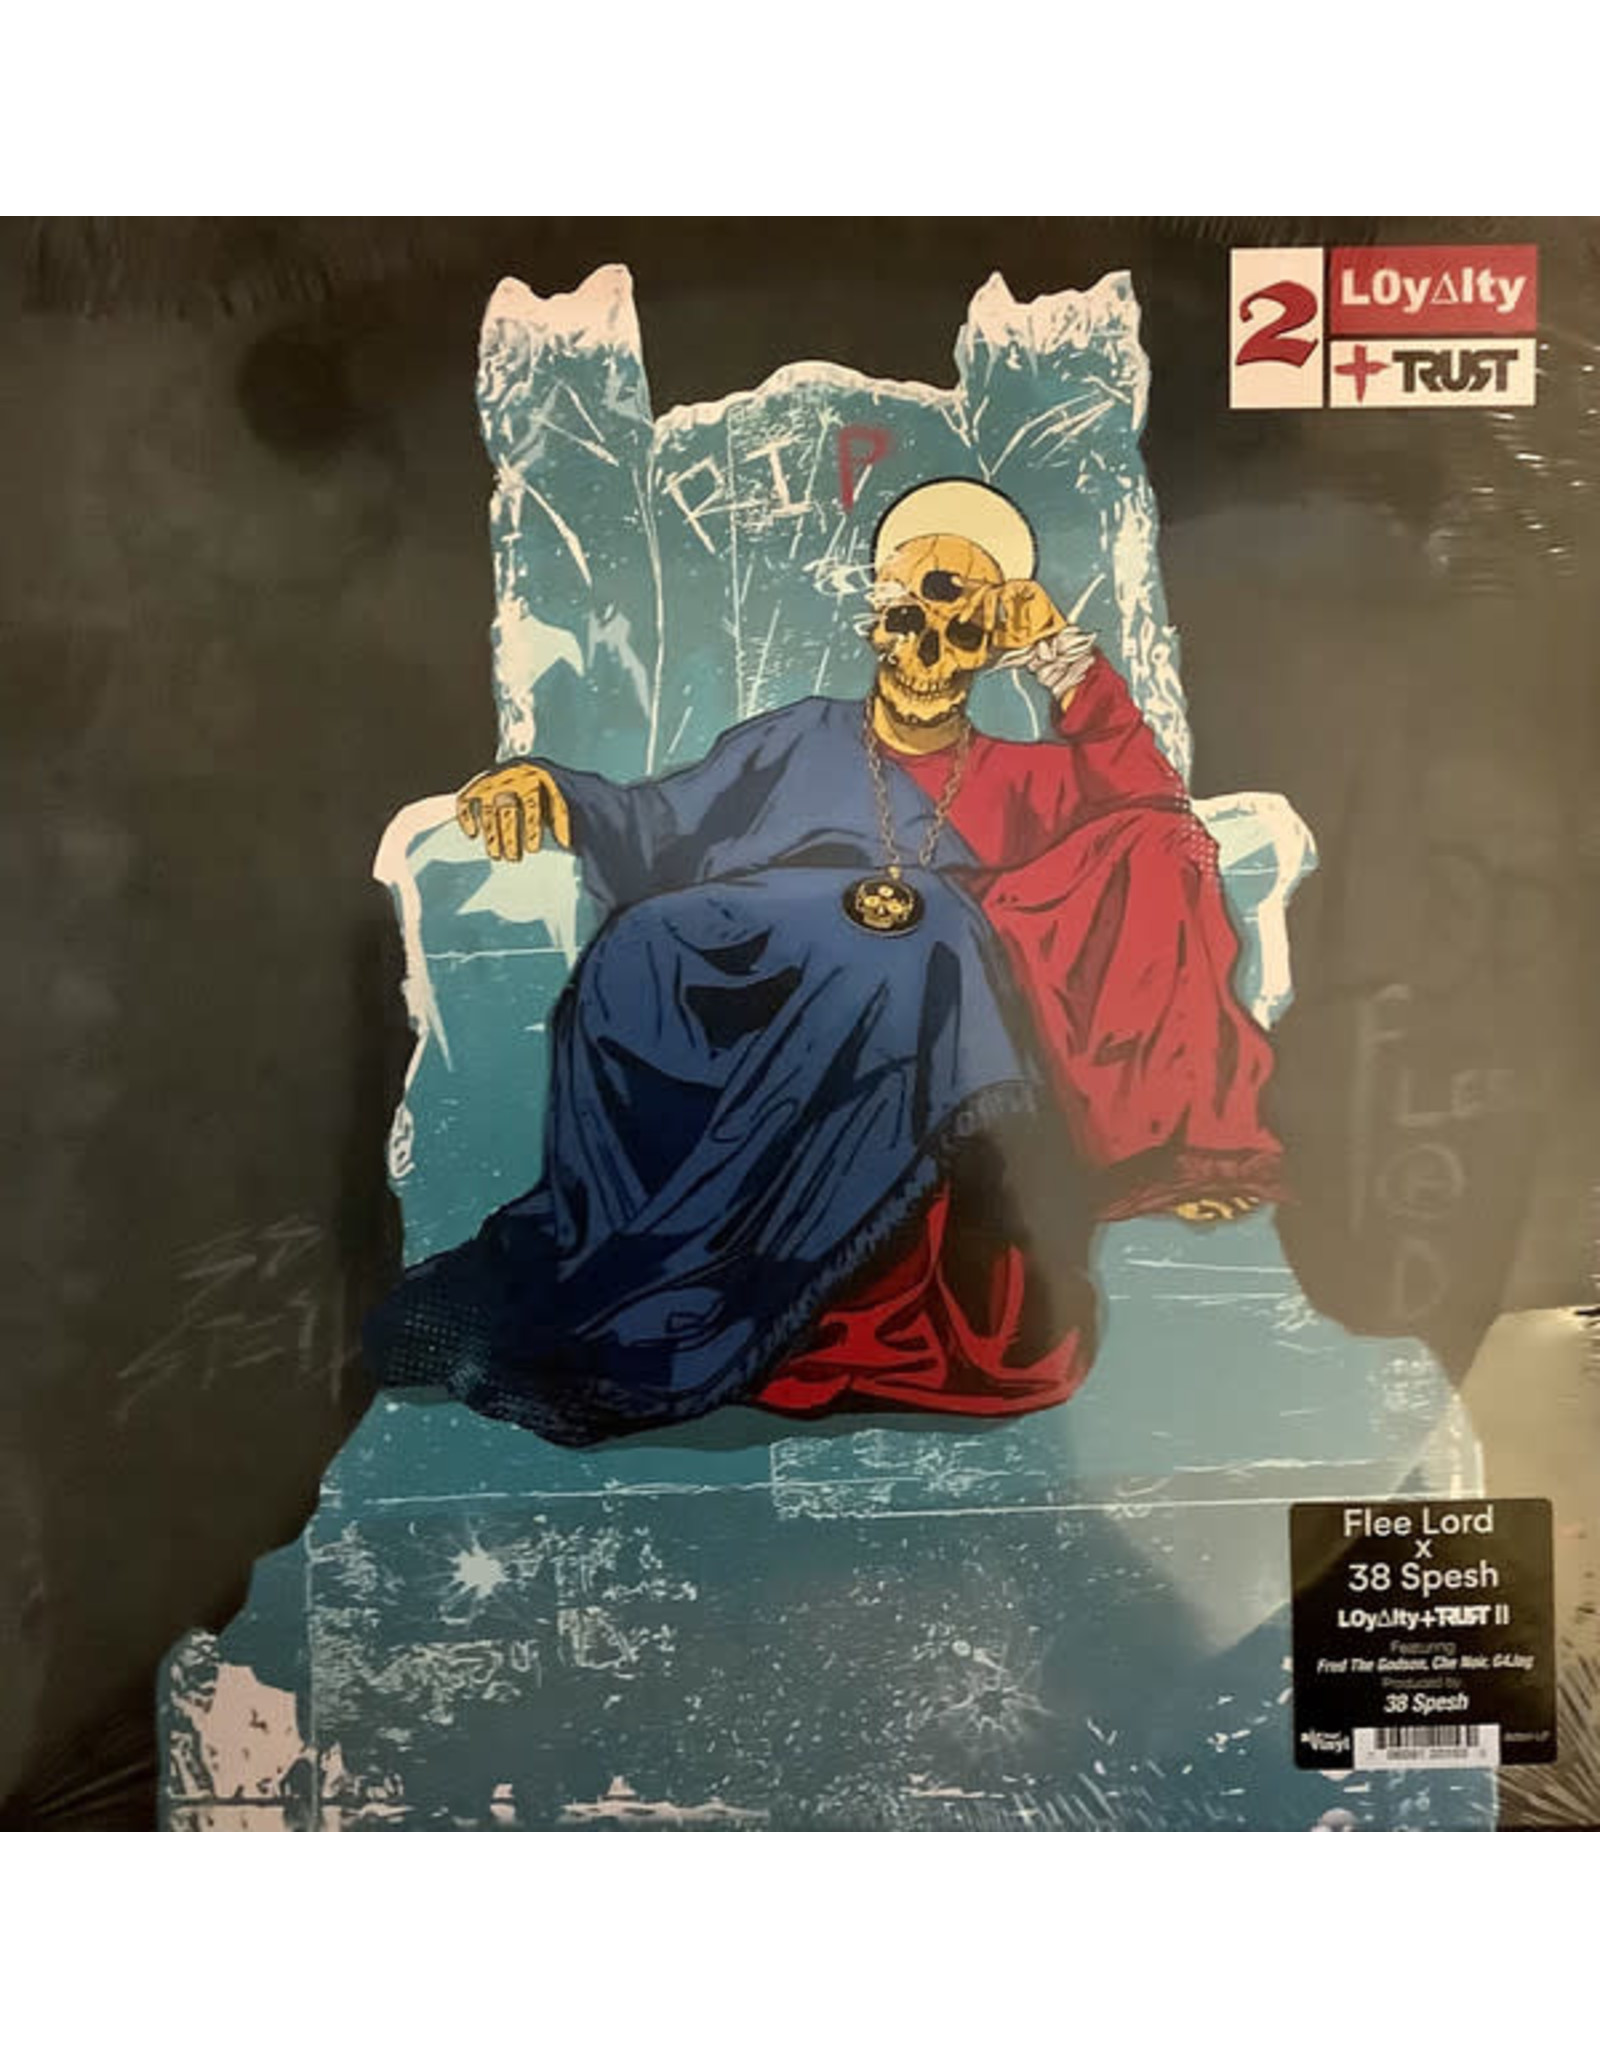 Flee Lord & 38 Spesh - Loyalty & Trust II  LP